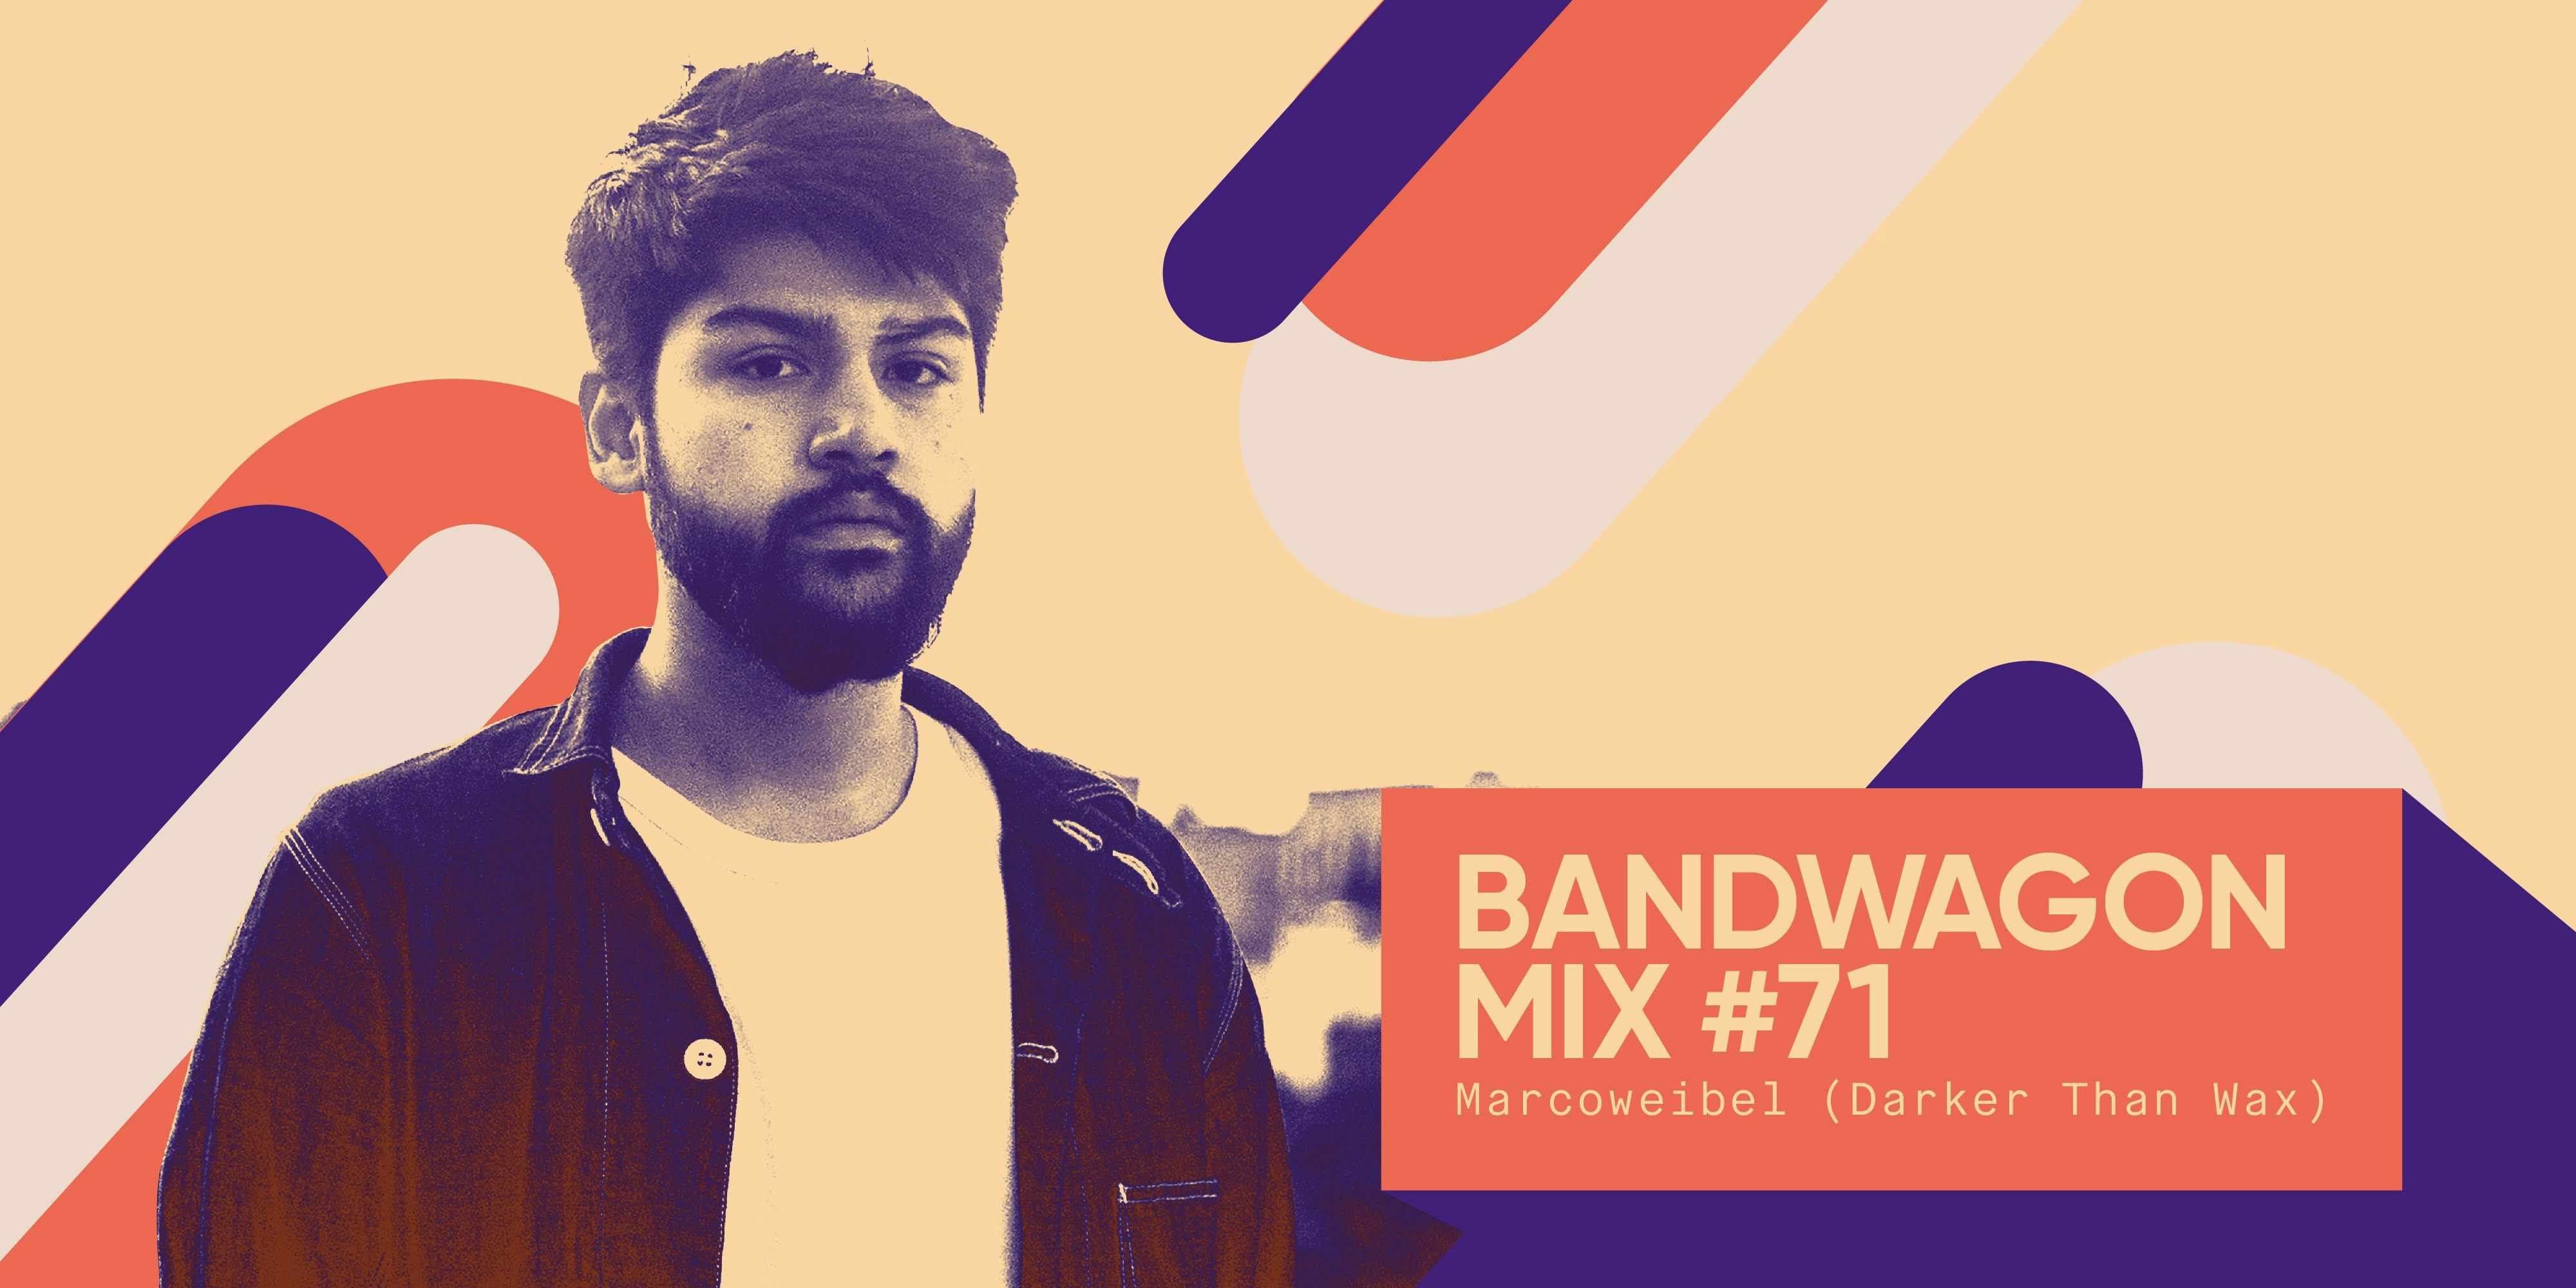 Bandwagon Mix #71: Marcoweibel (Darker Than Wax)